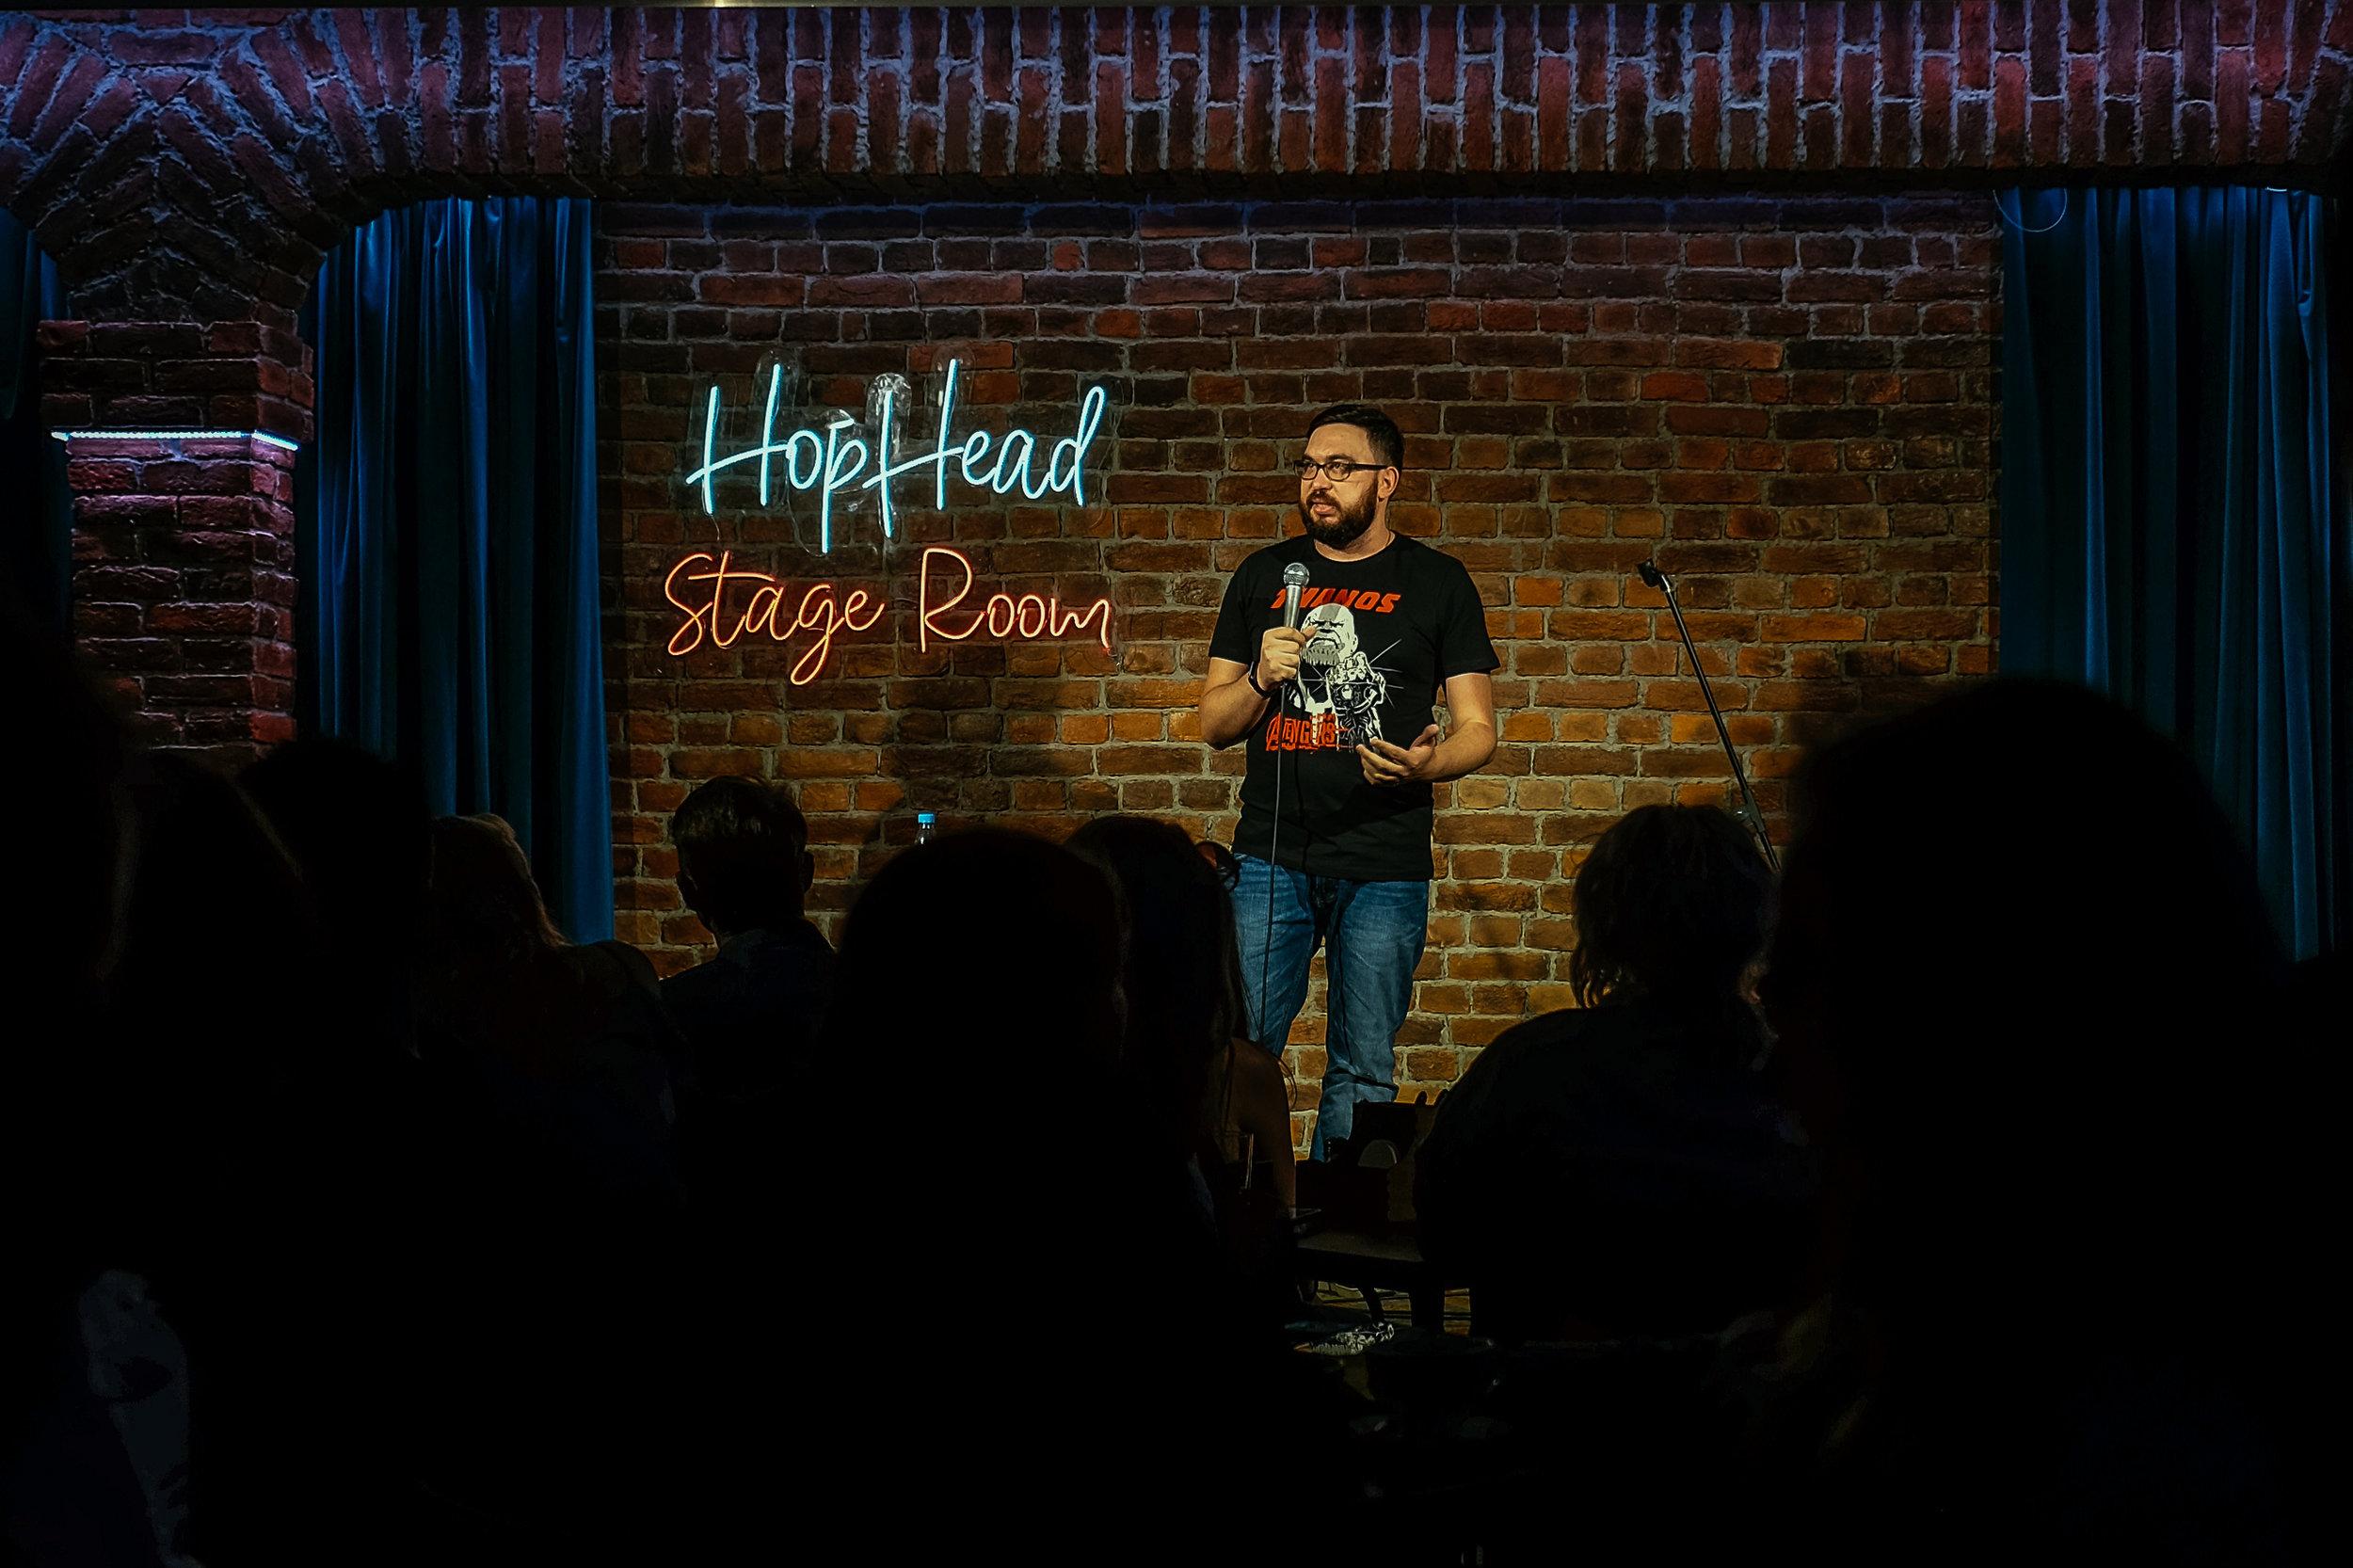 hophead stage room.jpg